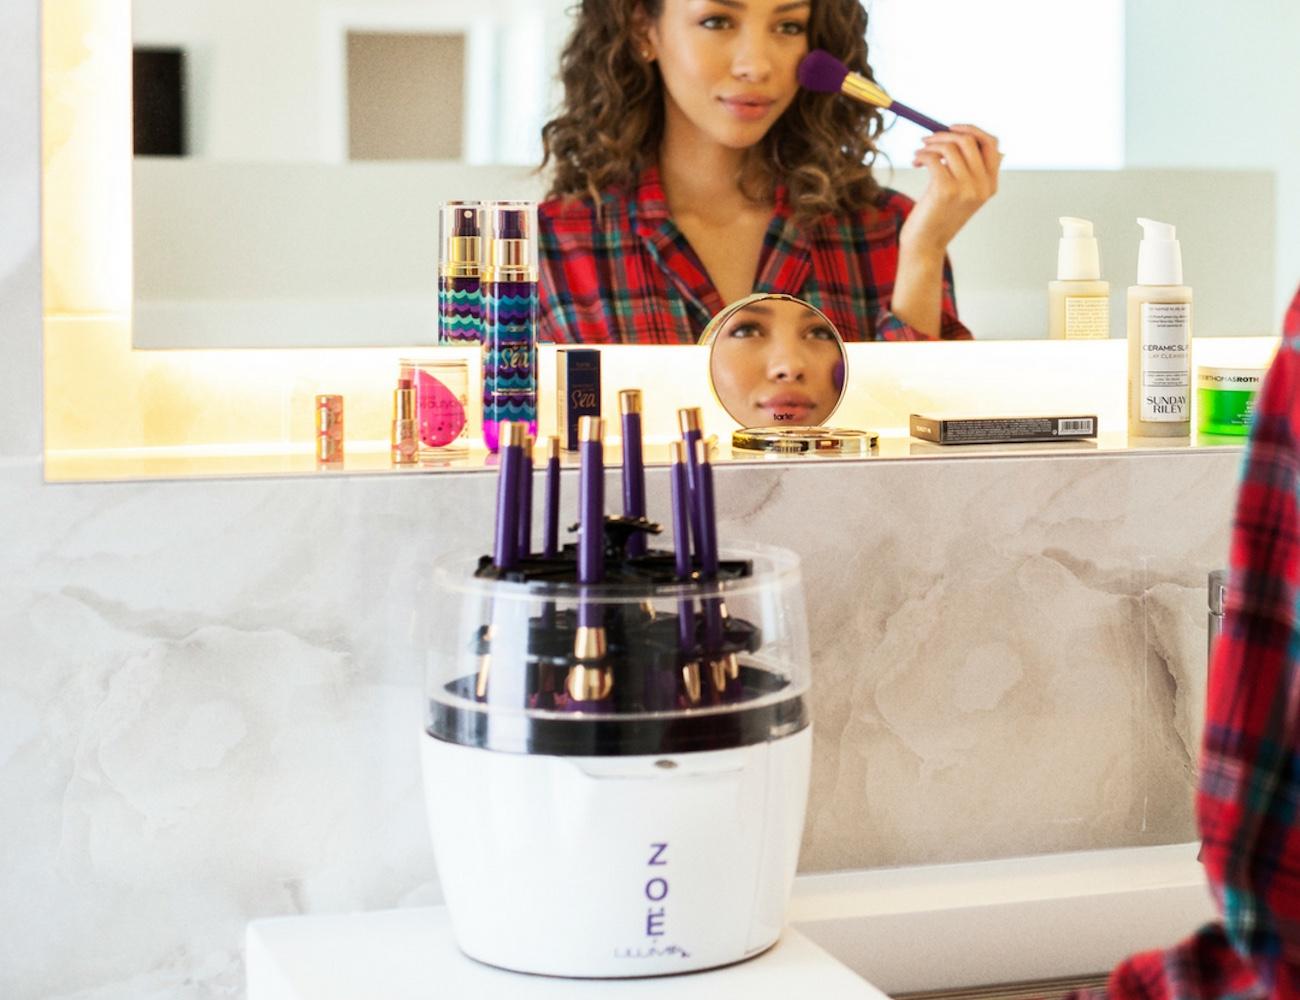 Zoë Makeup Brush Cleaner